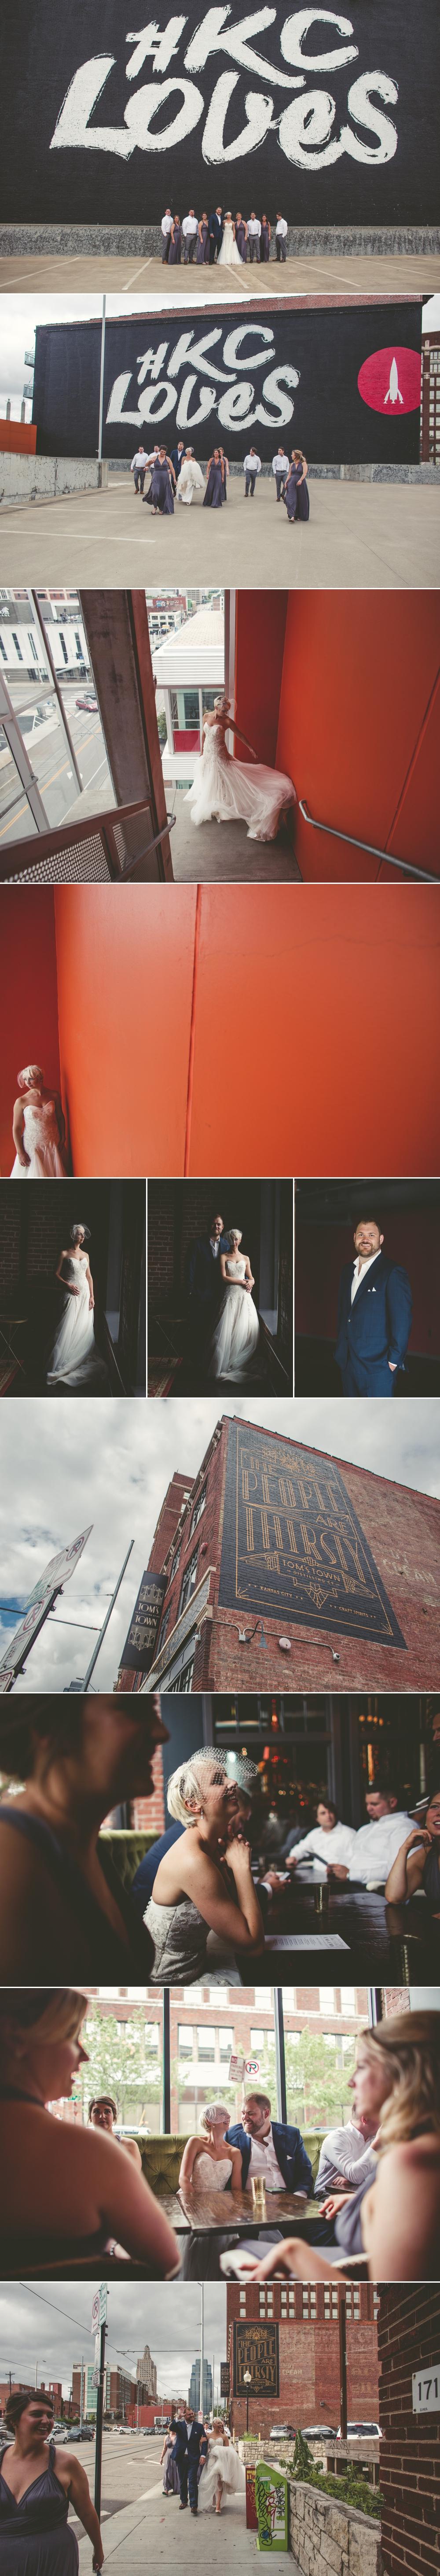 jason_domingues_photography_best_kansas_city_photographer_kc_weddings_toms_town_bauer_0002.jpg